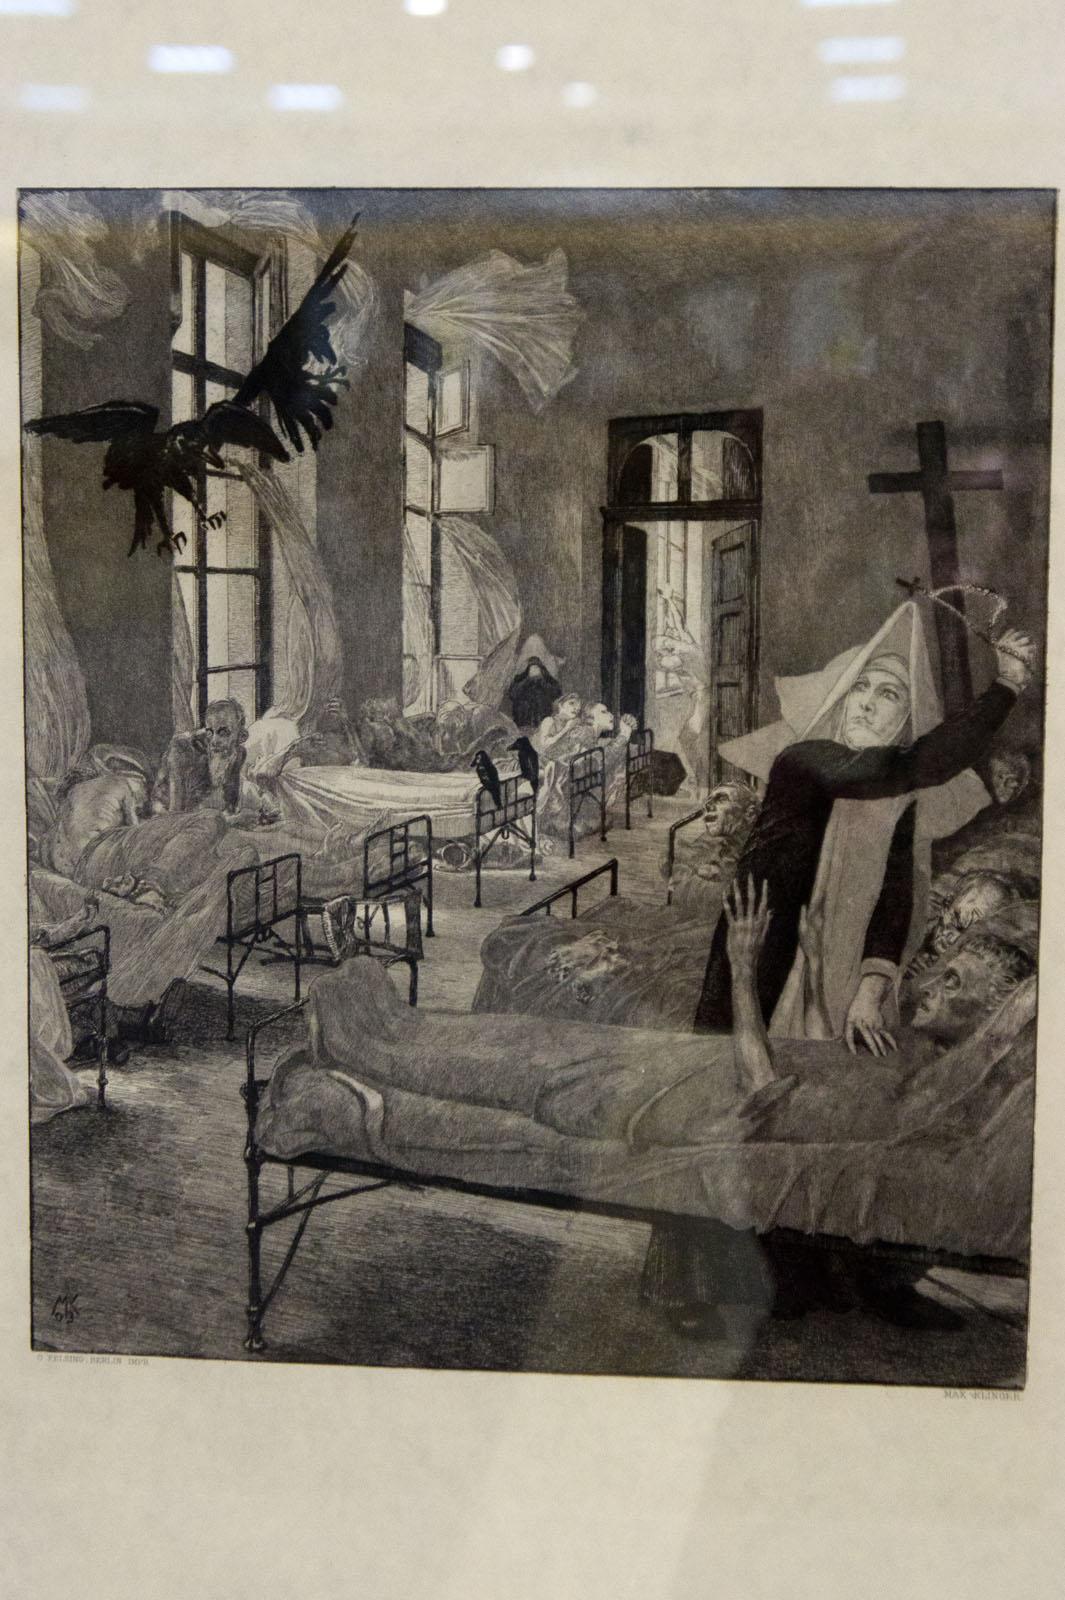 Фото №76482. Чума. 1903, Макс Клингер (1857-1920)